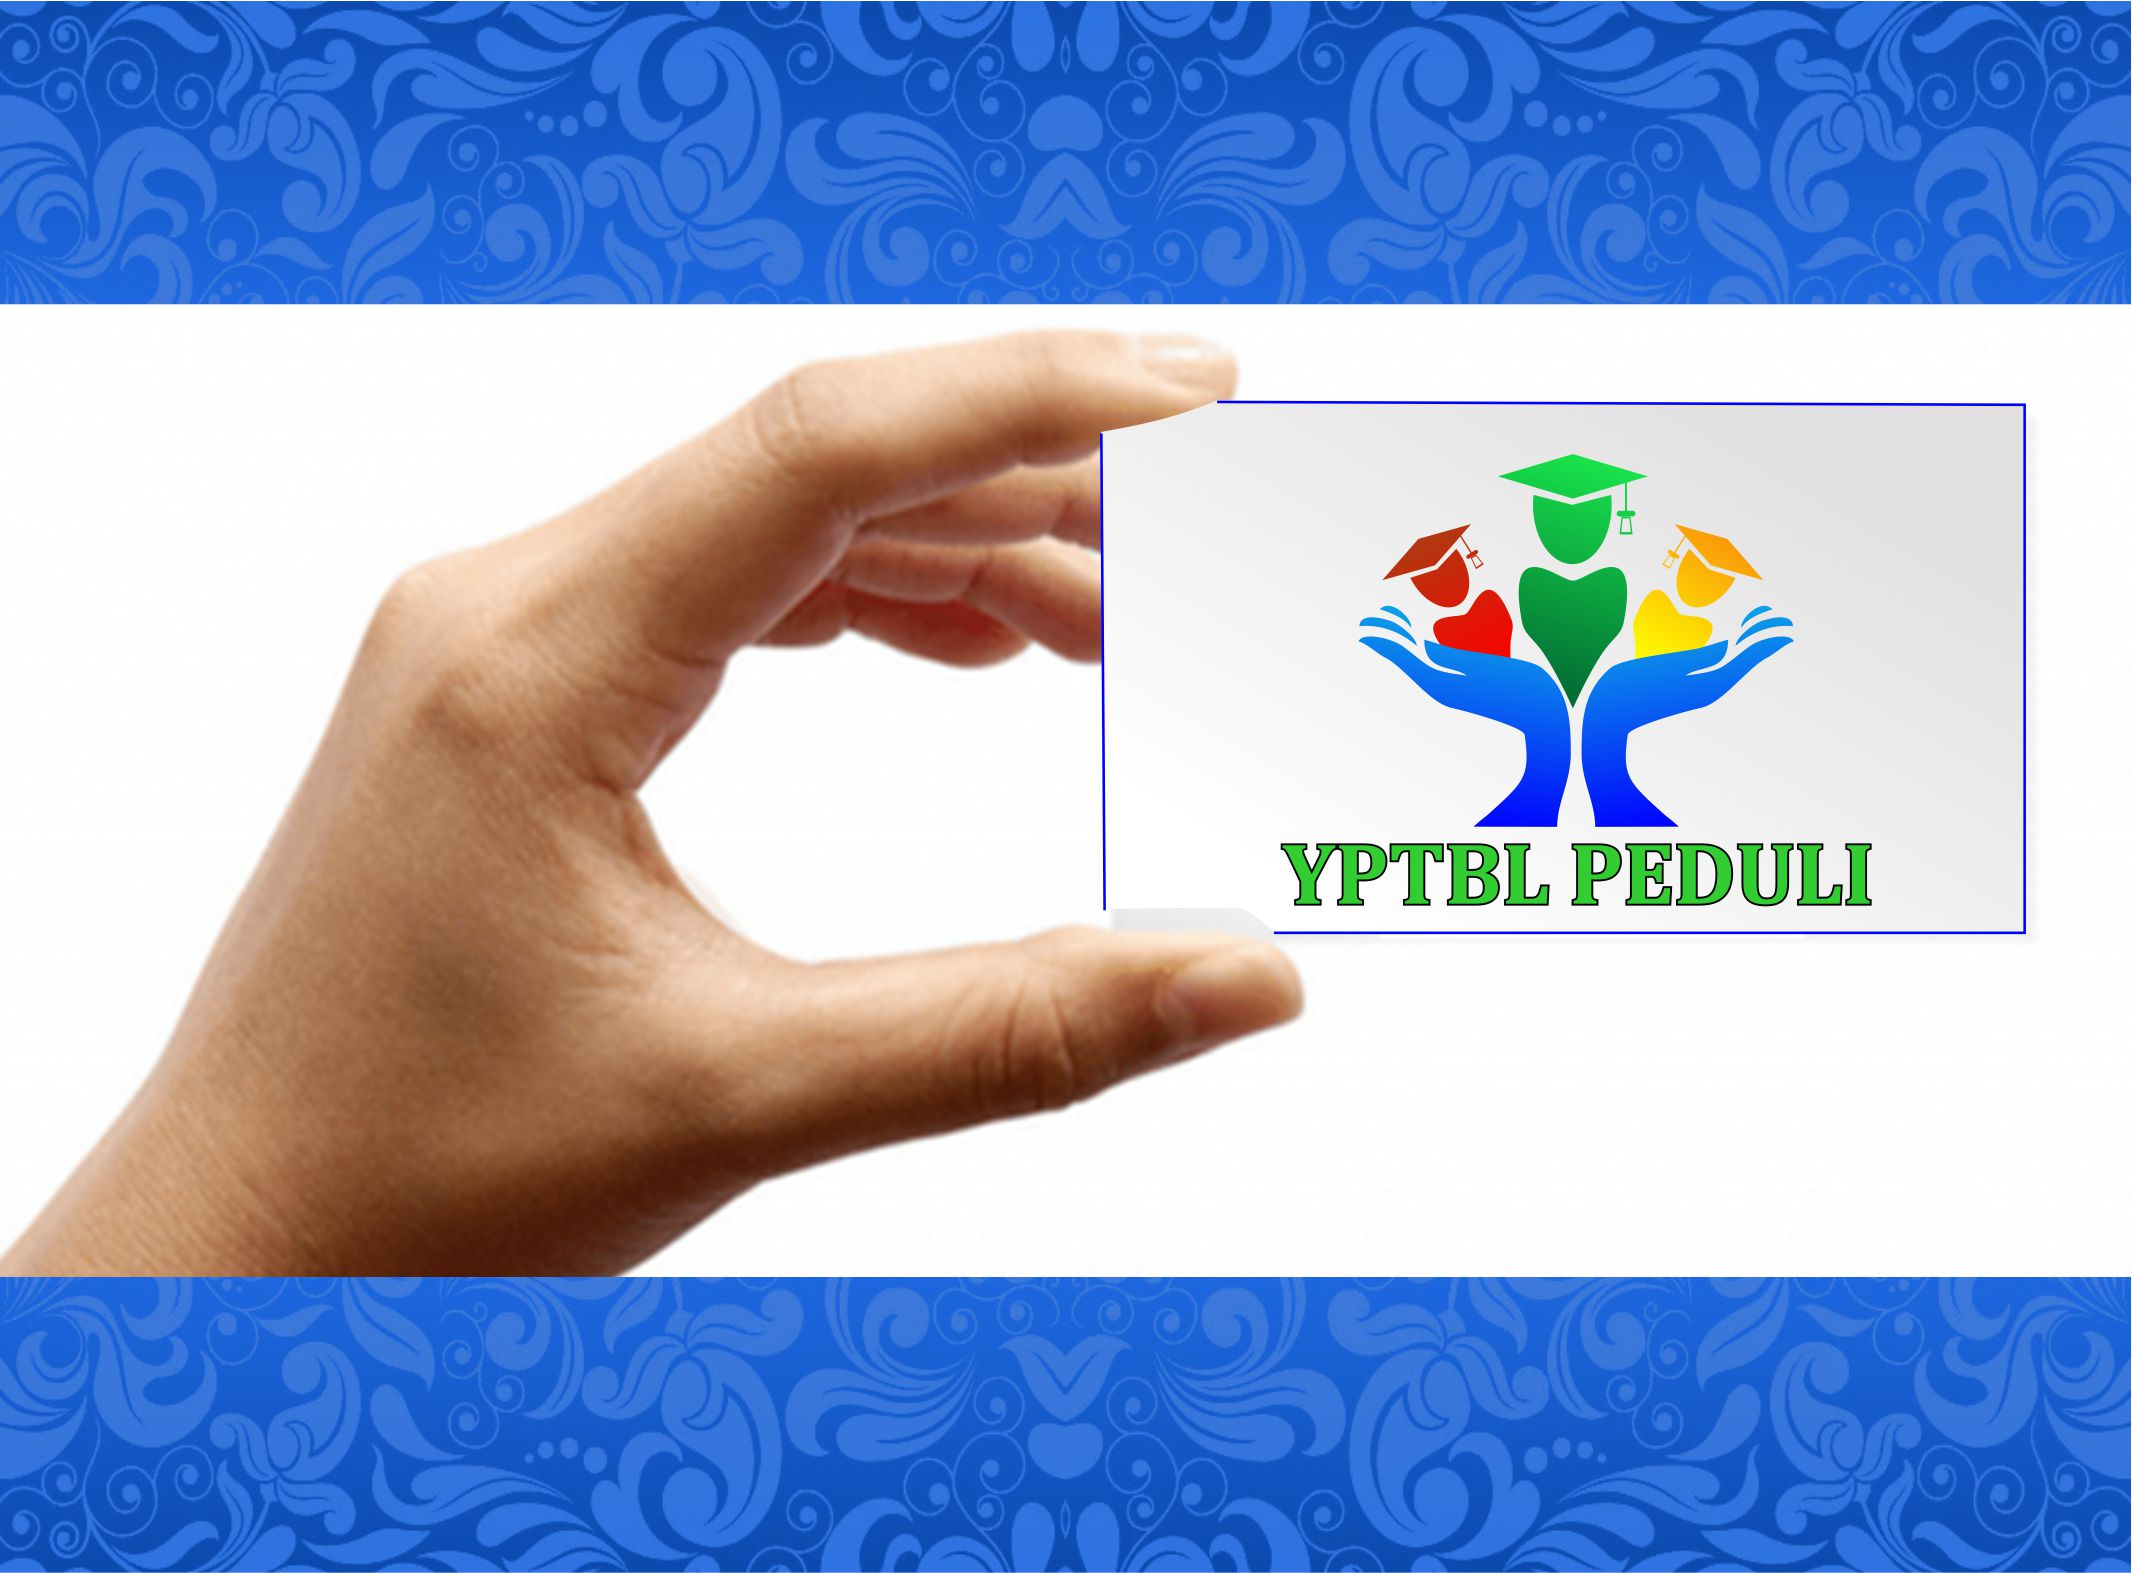 YPTBL Peduli